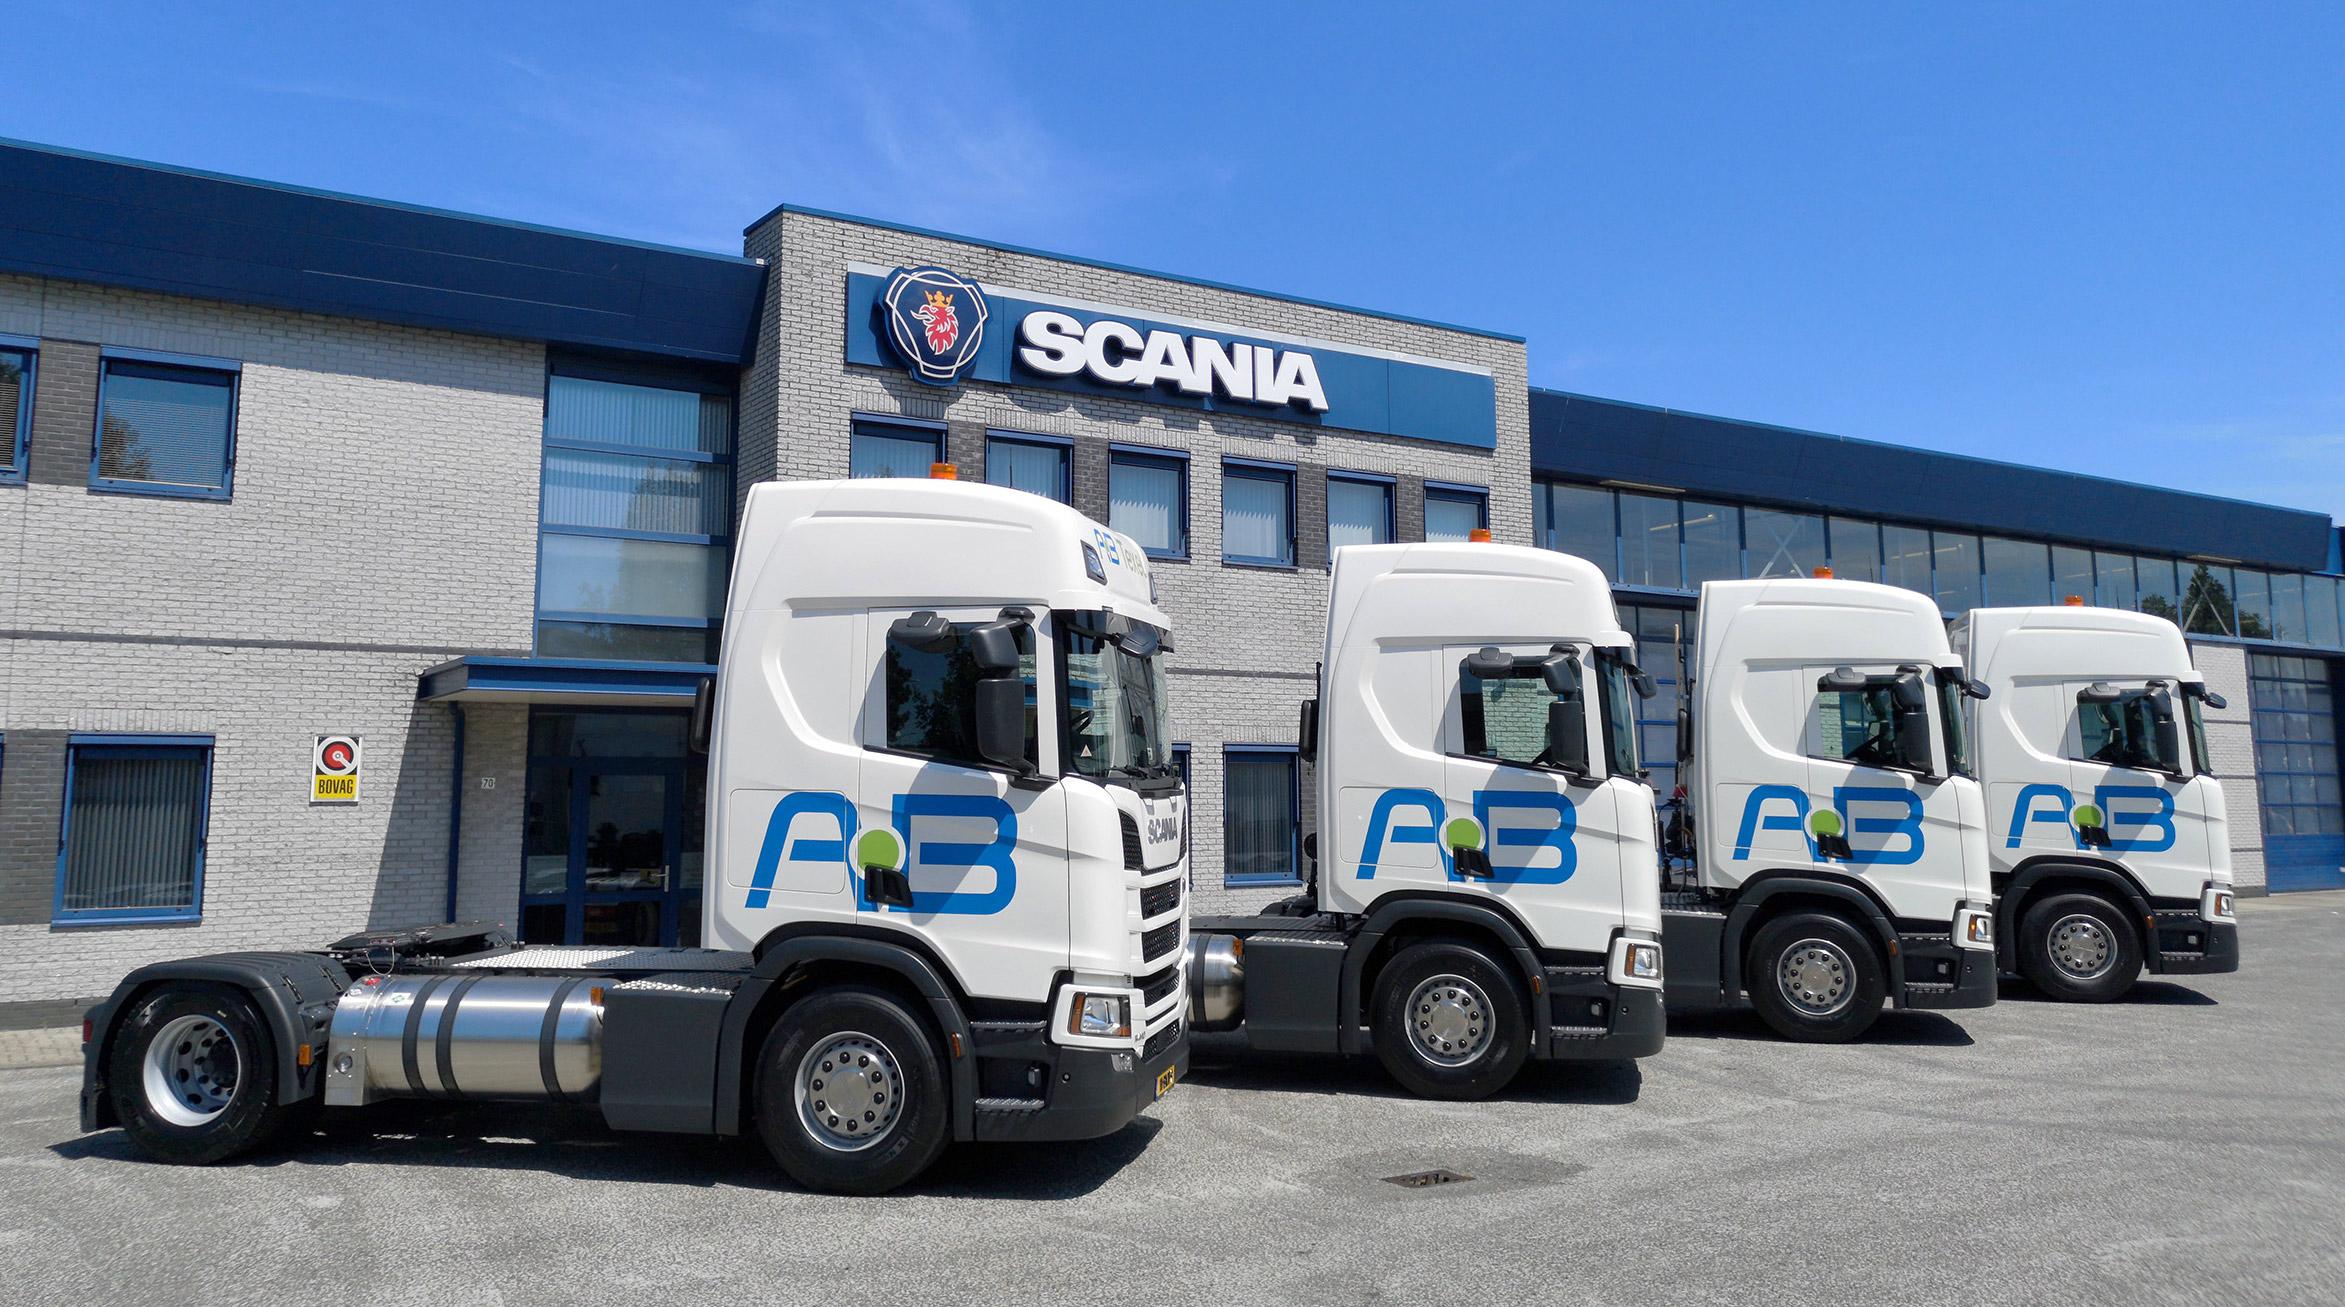 bron: Scania